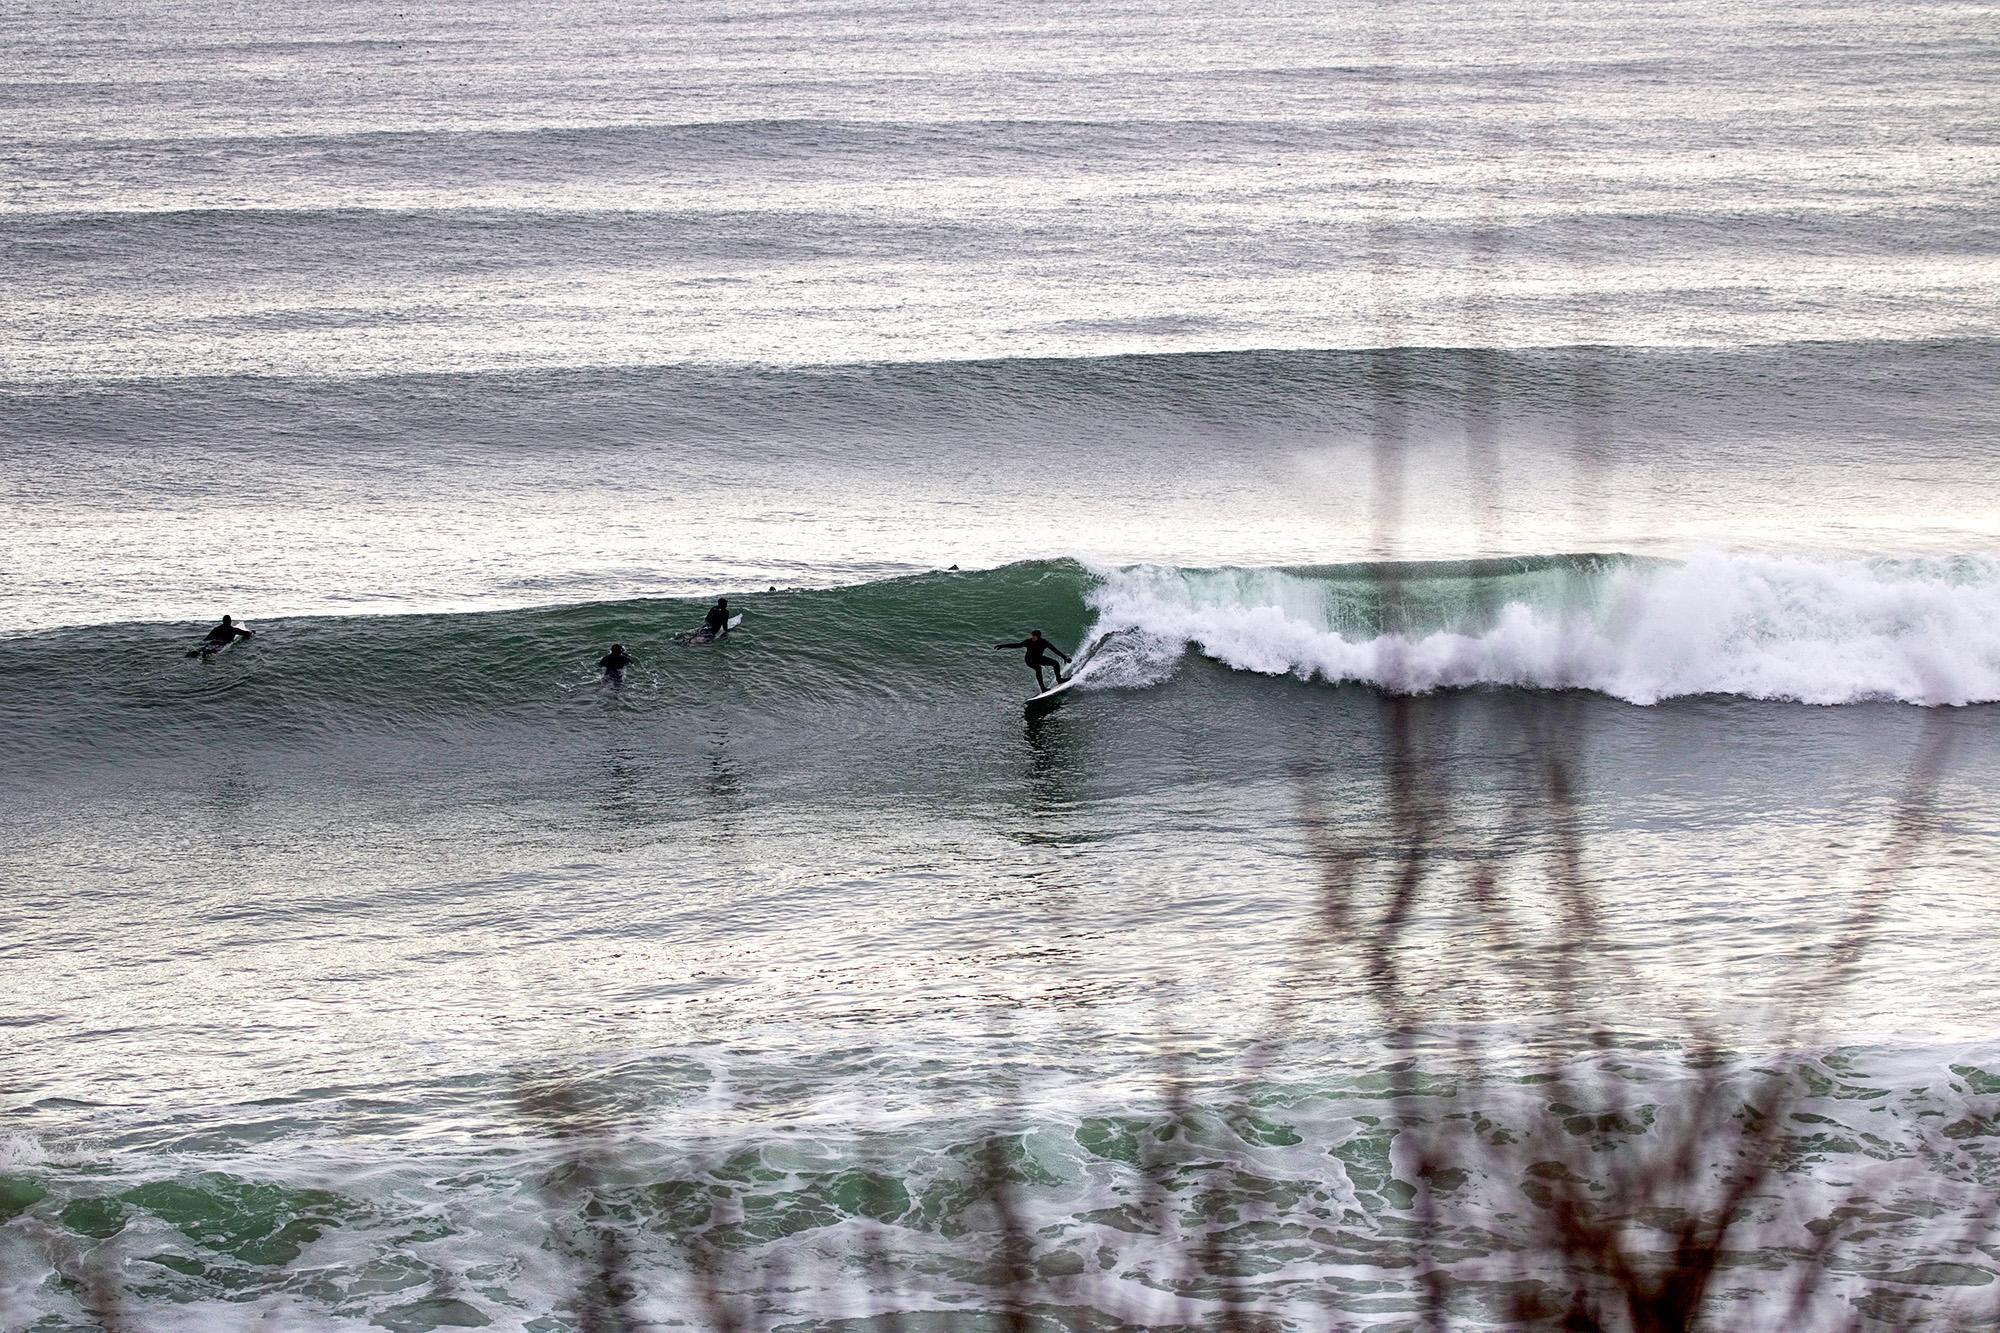 1-19-17 MTK Surfer 11.jpg